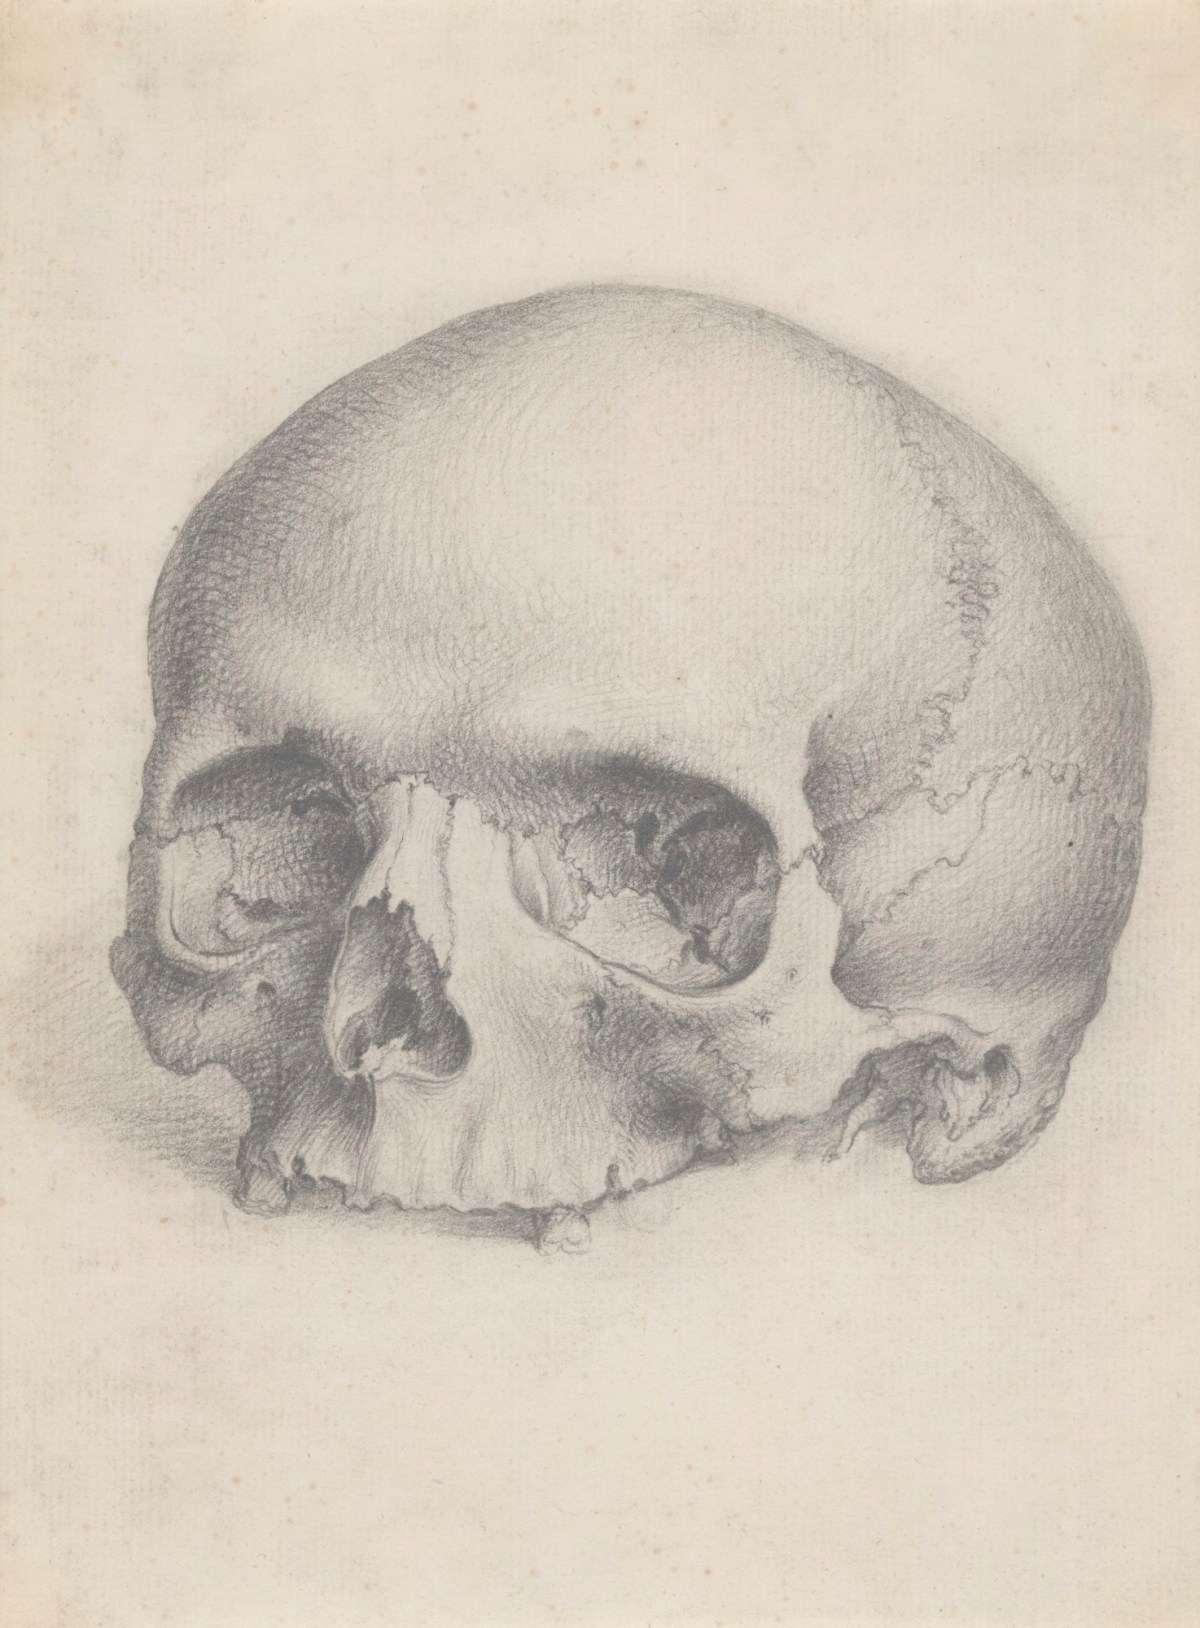 czaszka scrum